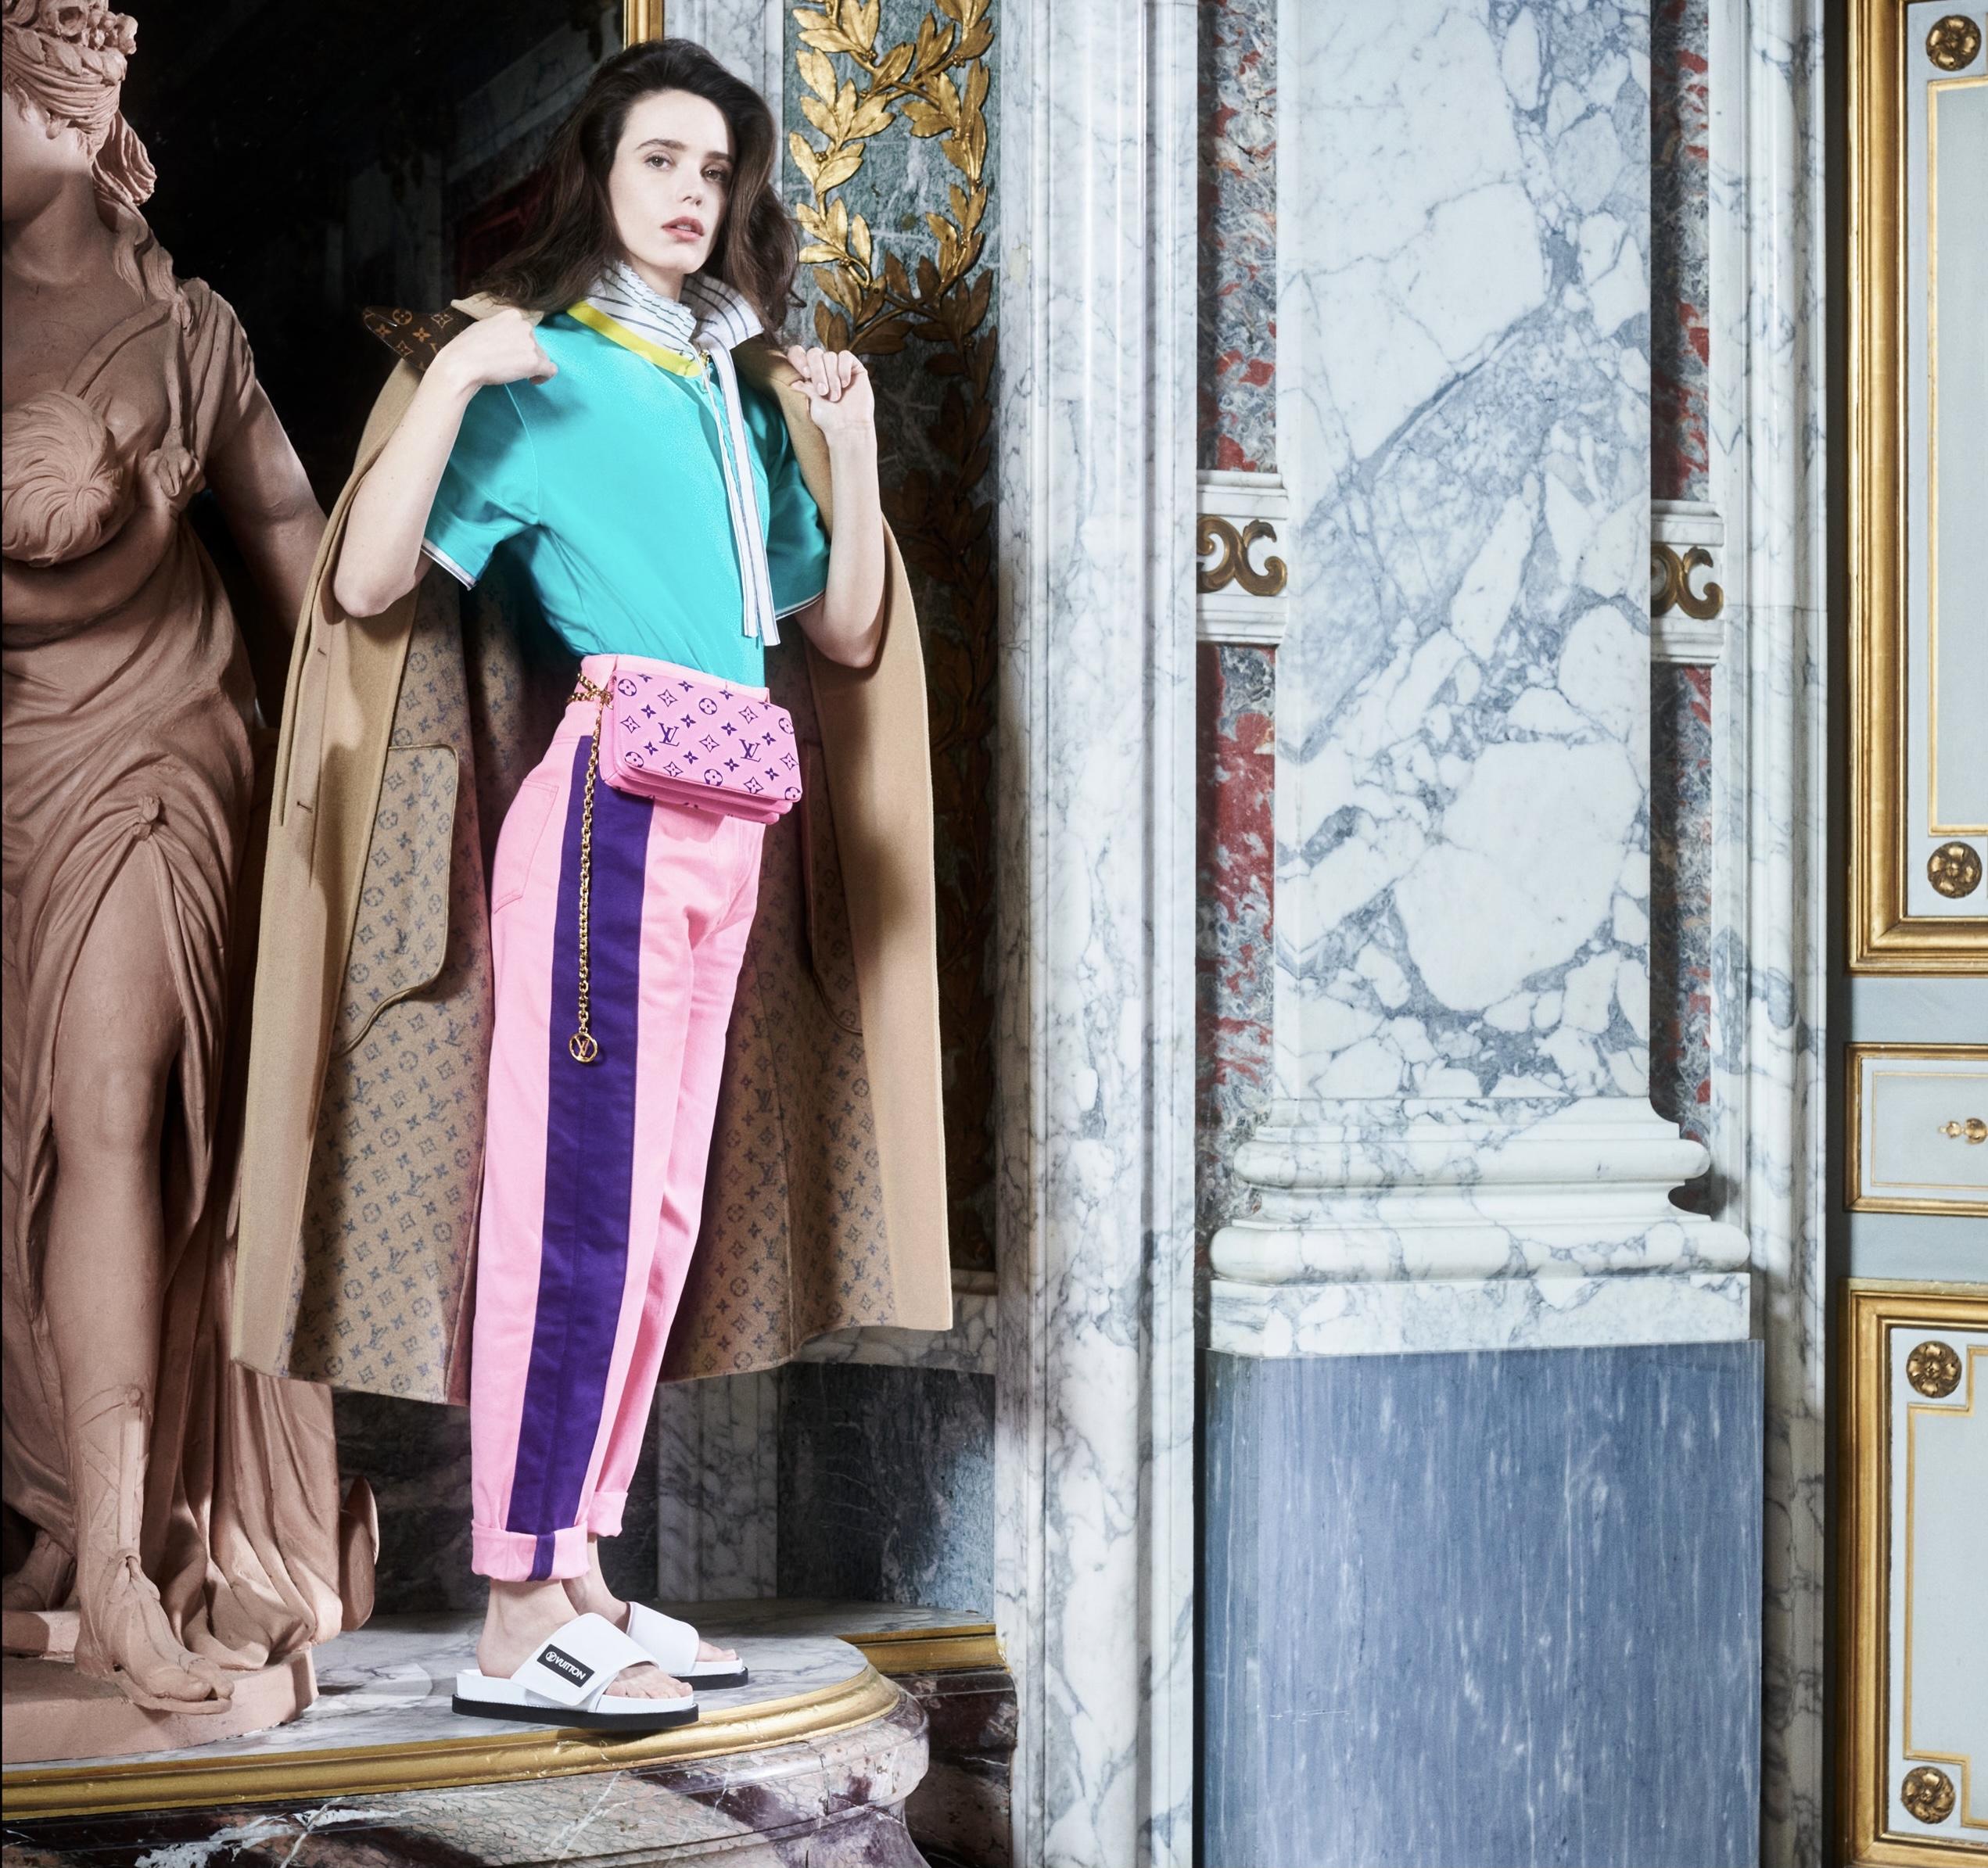 Louis Vuitton's Pre-Fall 2021 bags